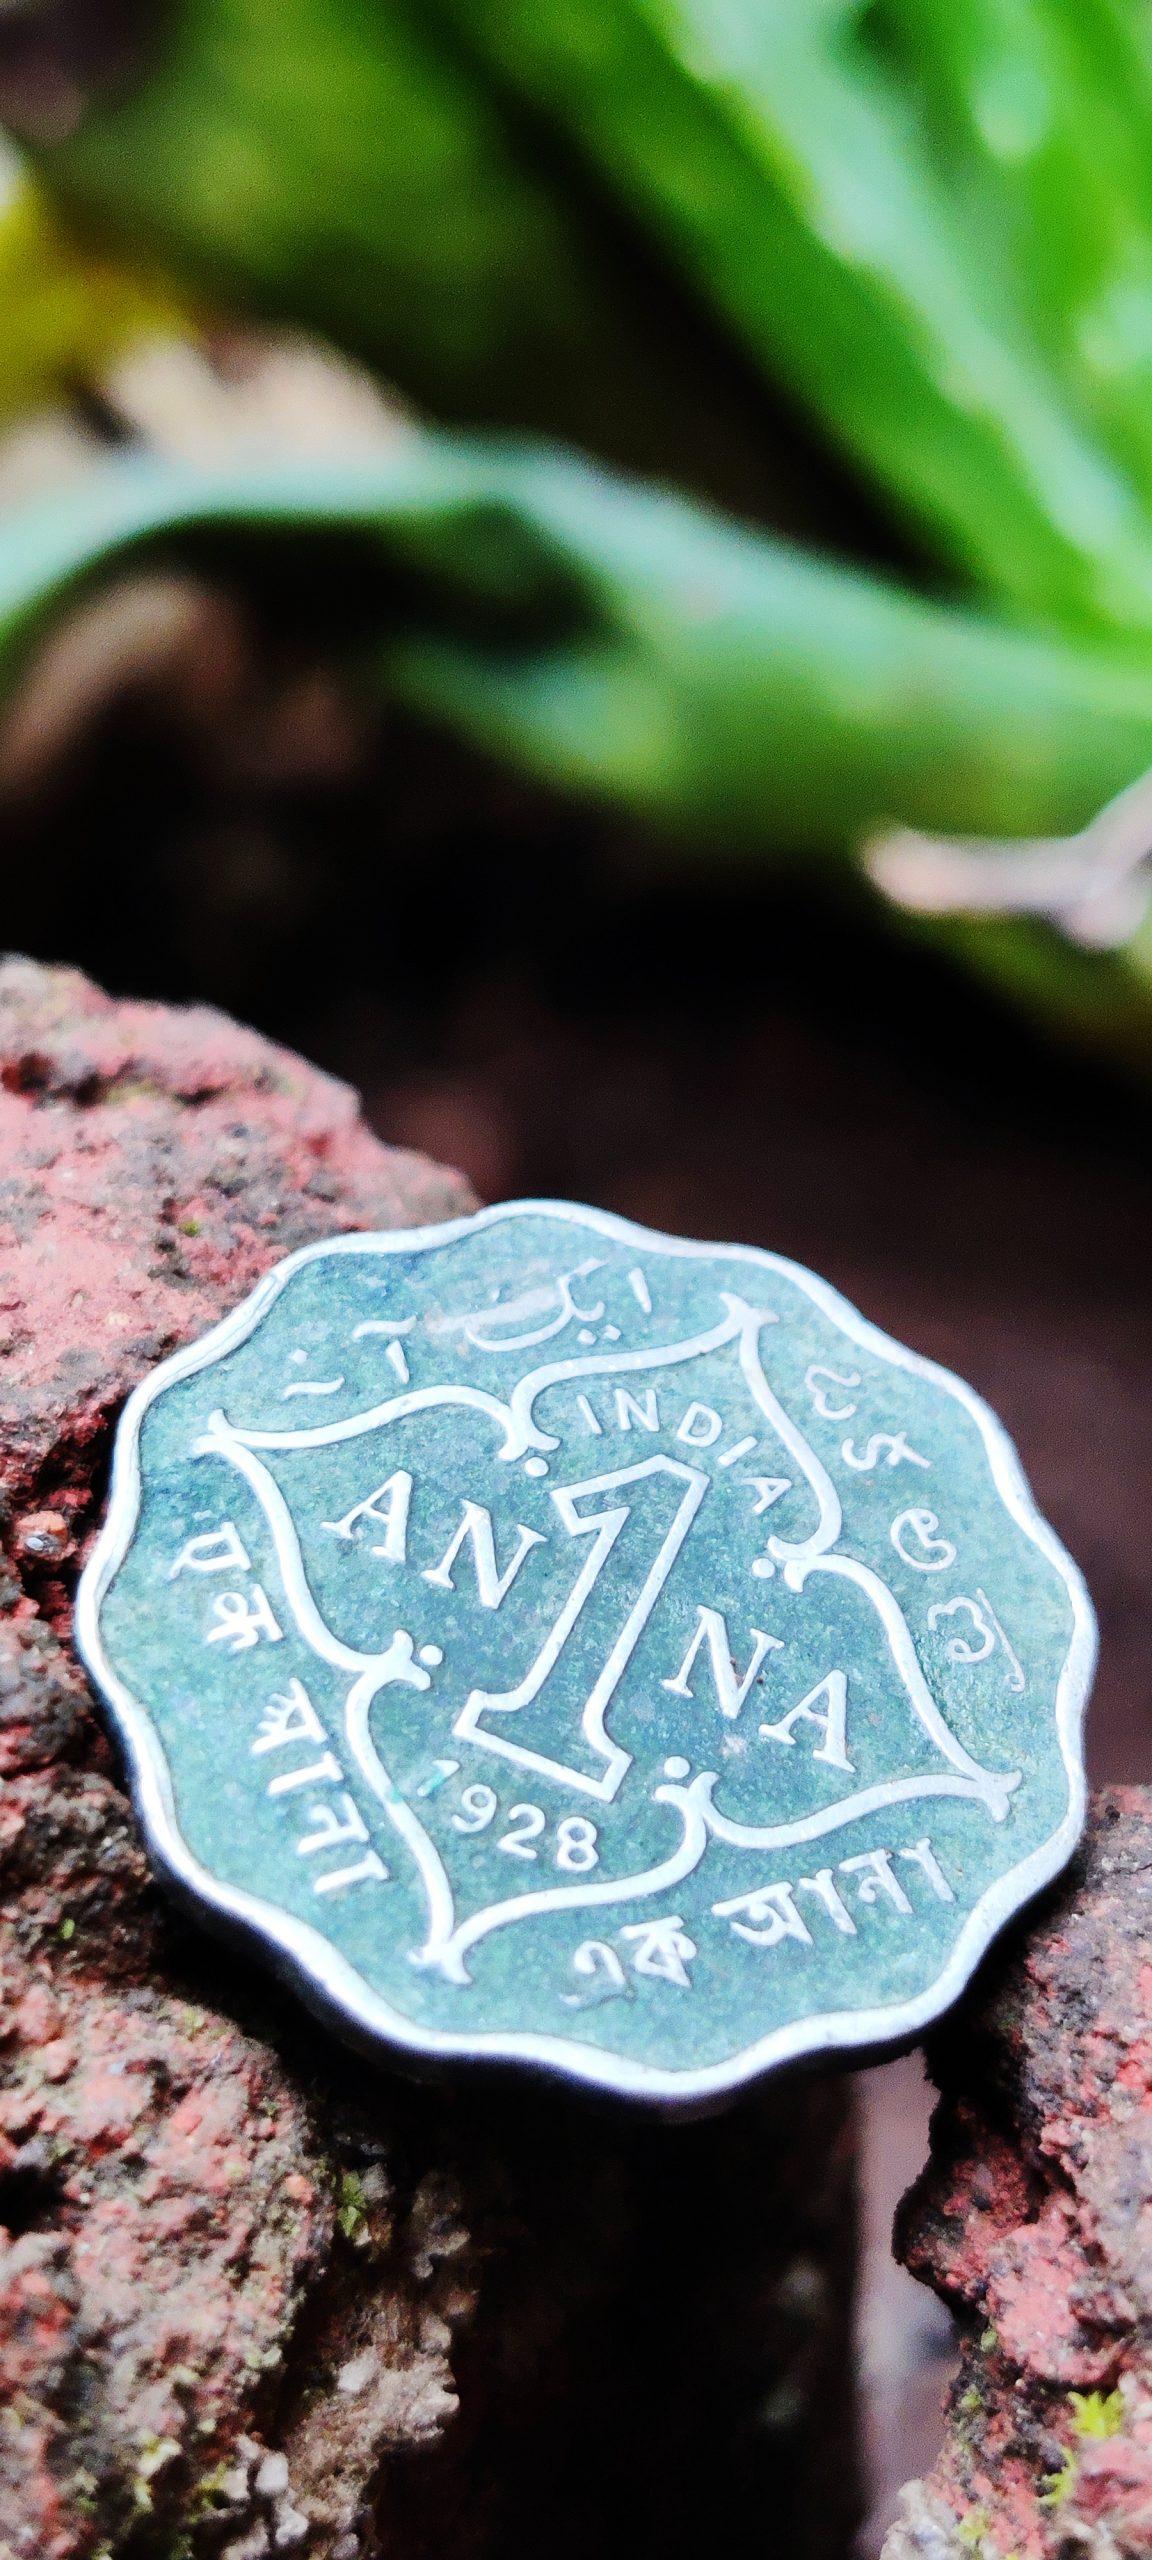 An old one Anna coin